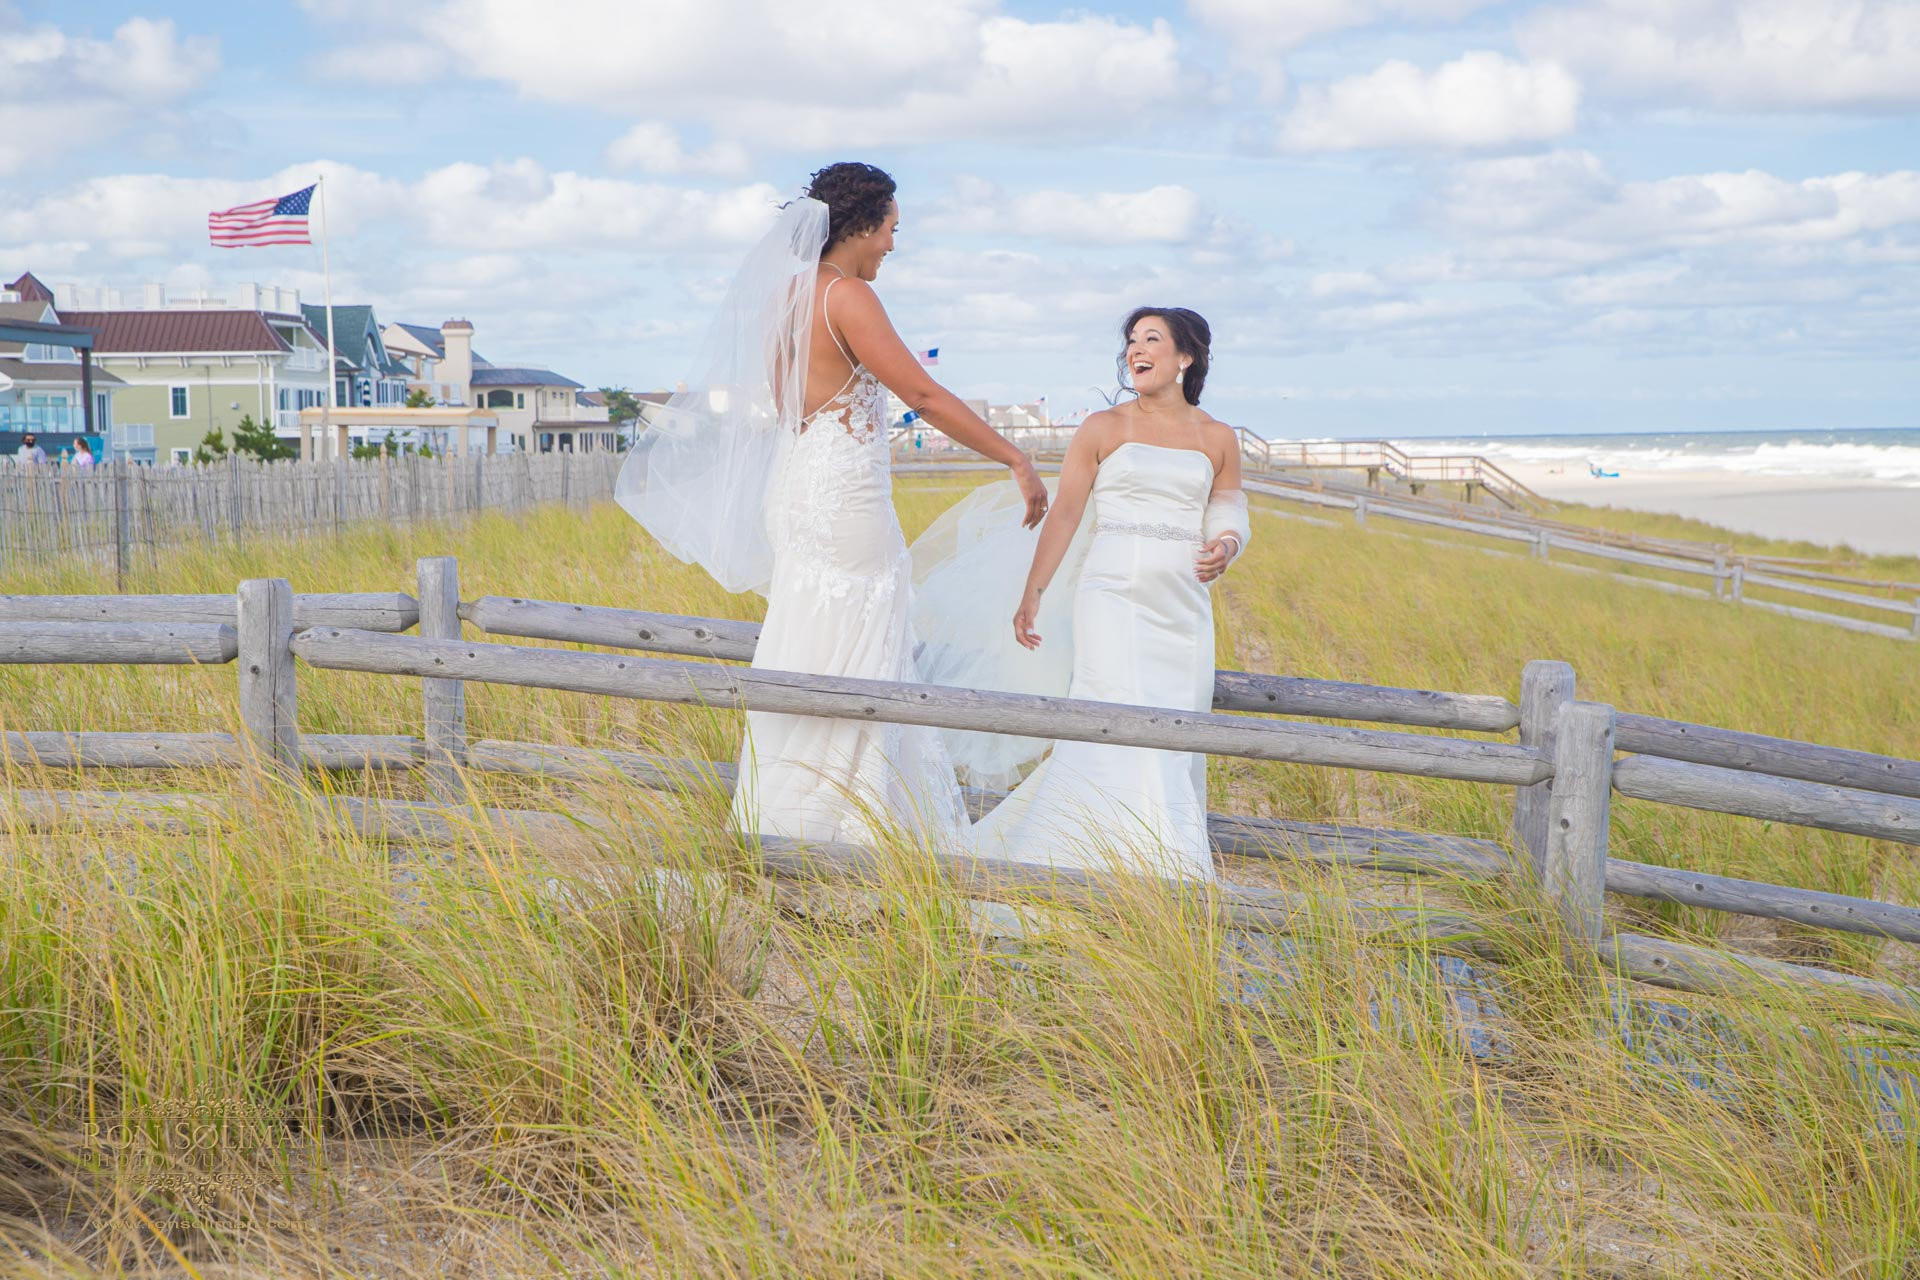 NEW JERSEY BEACH WEDDING 16